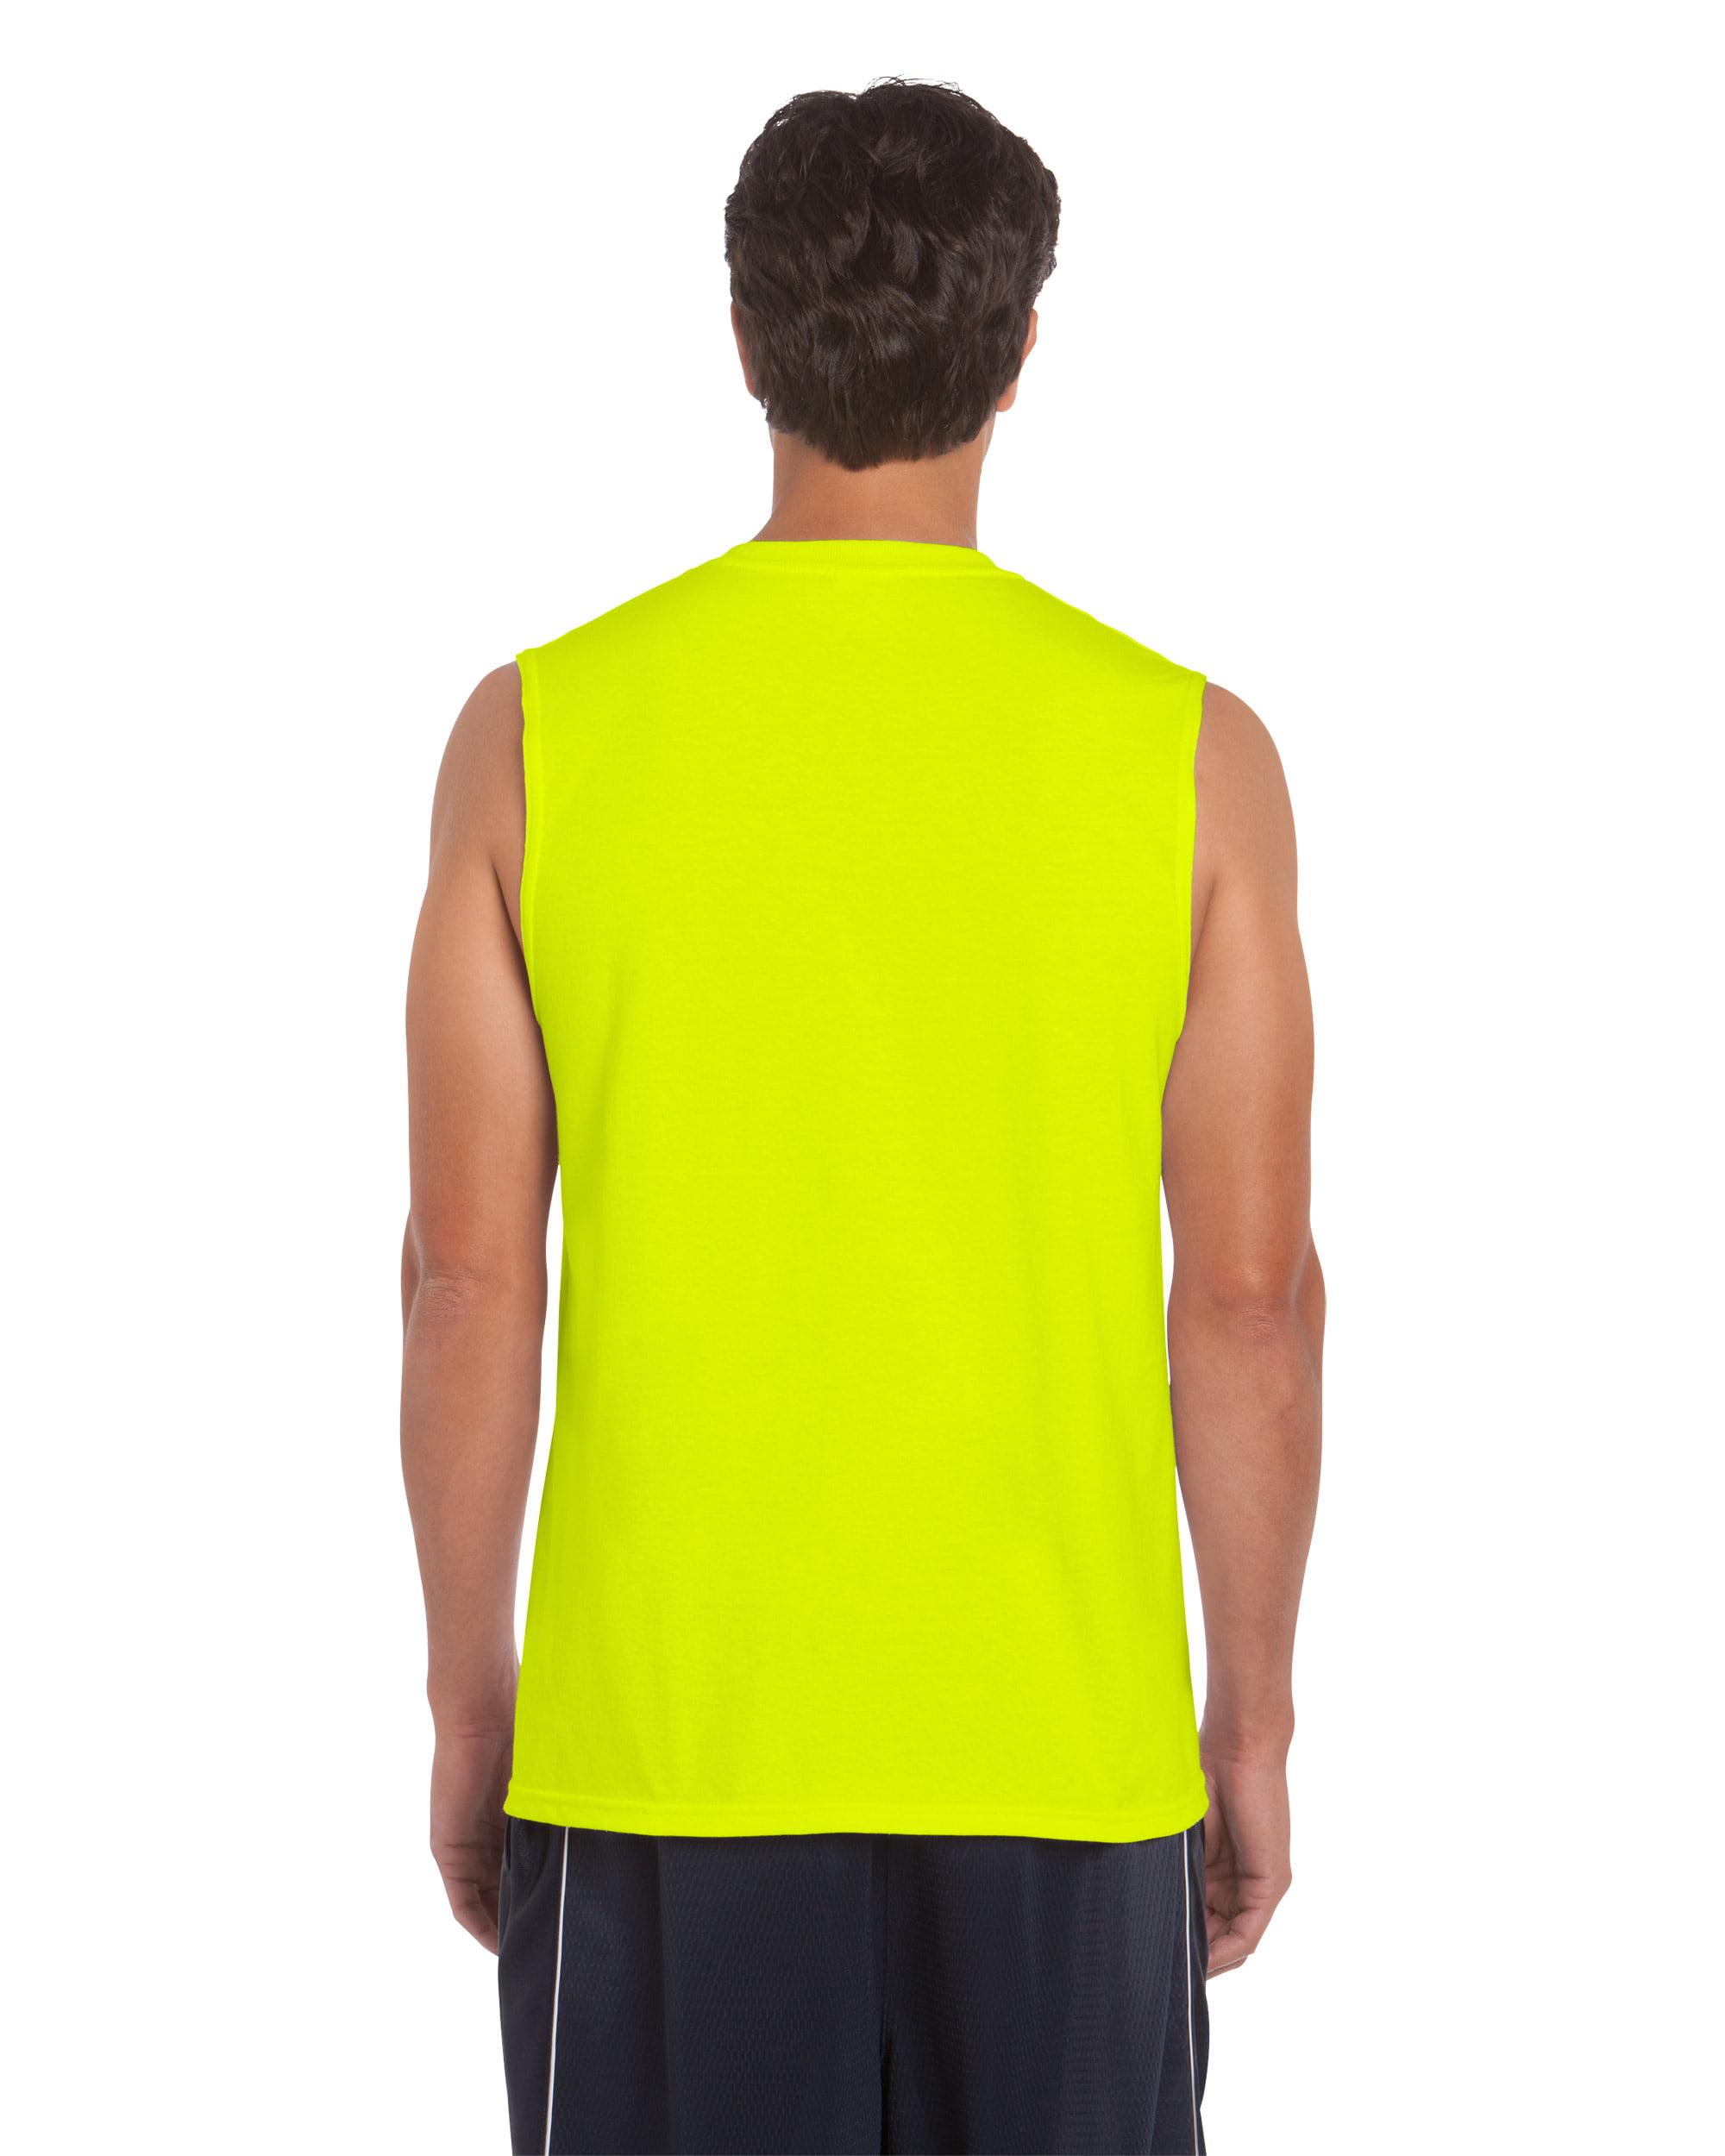 4133bf769c1 Artix - Artix Oklahoma City Ultra Cotton Sleeveless Men s T-Shirt ...